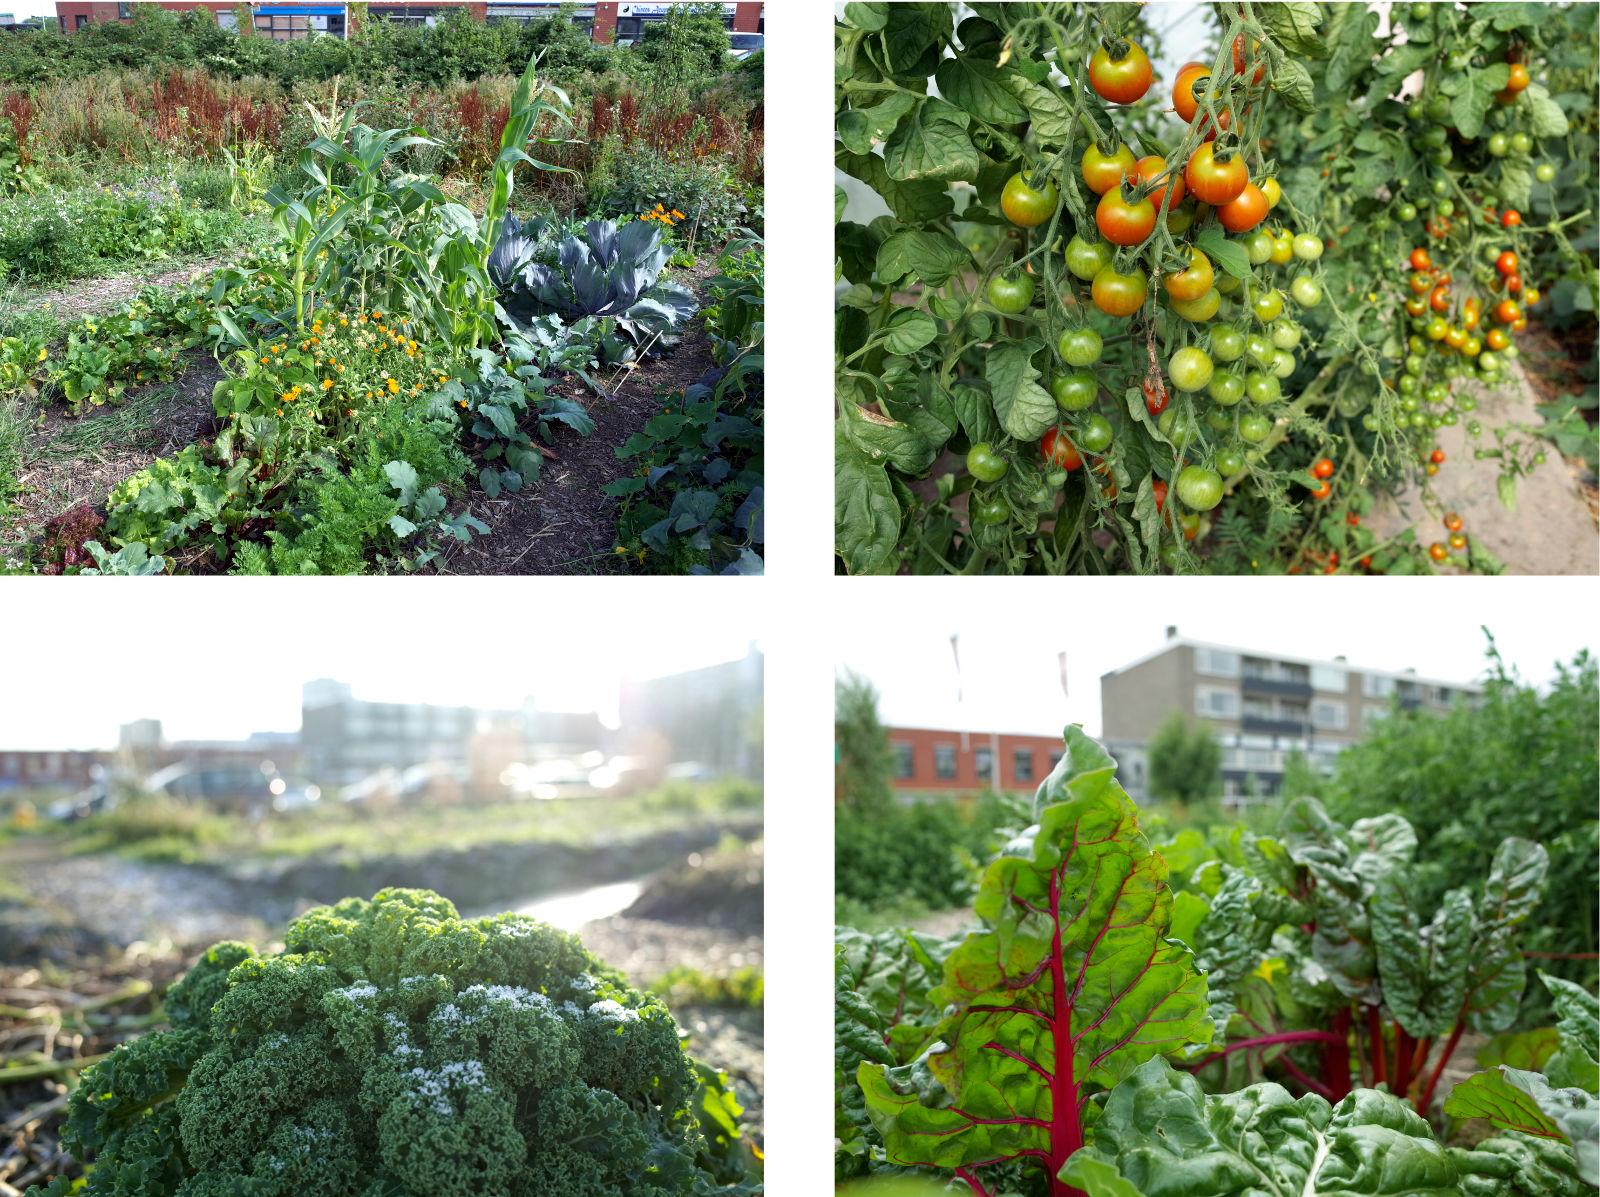 w_185_4_fotos_a_groente